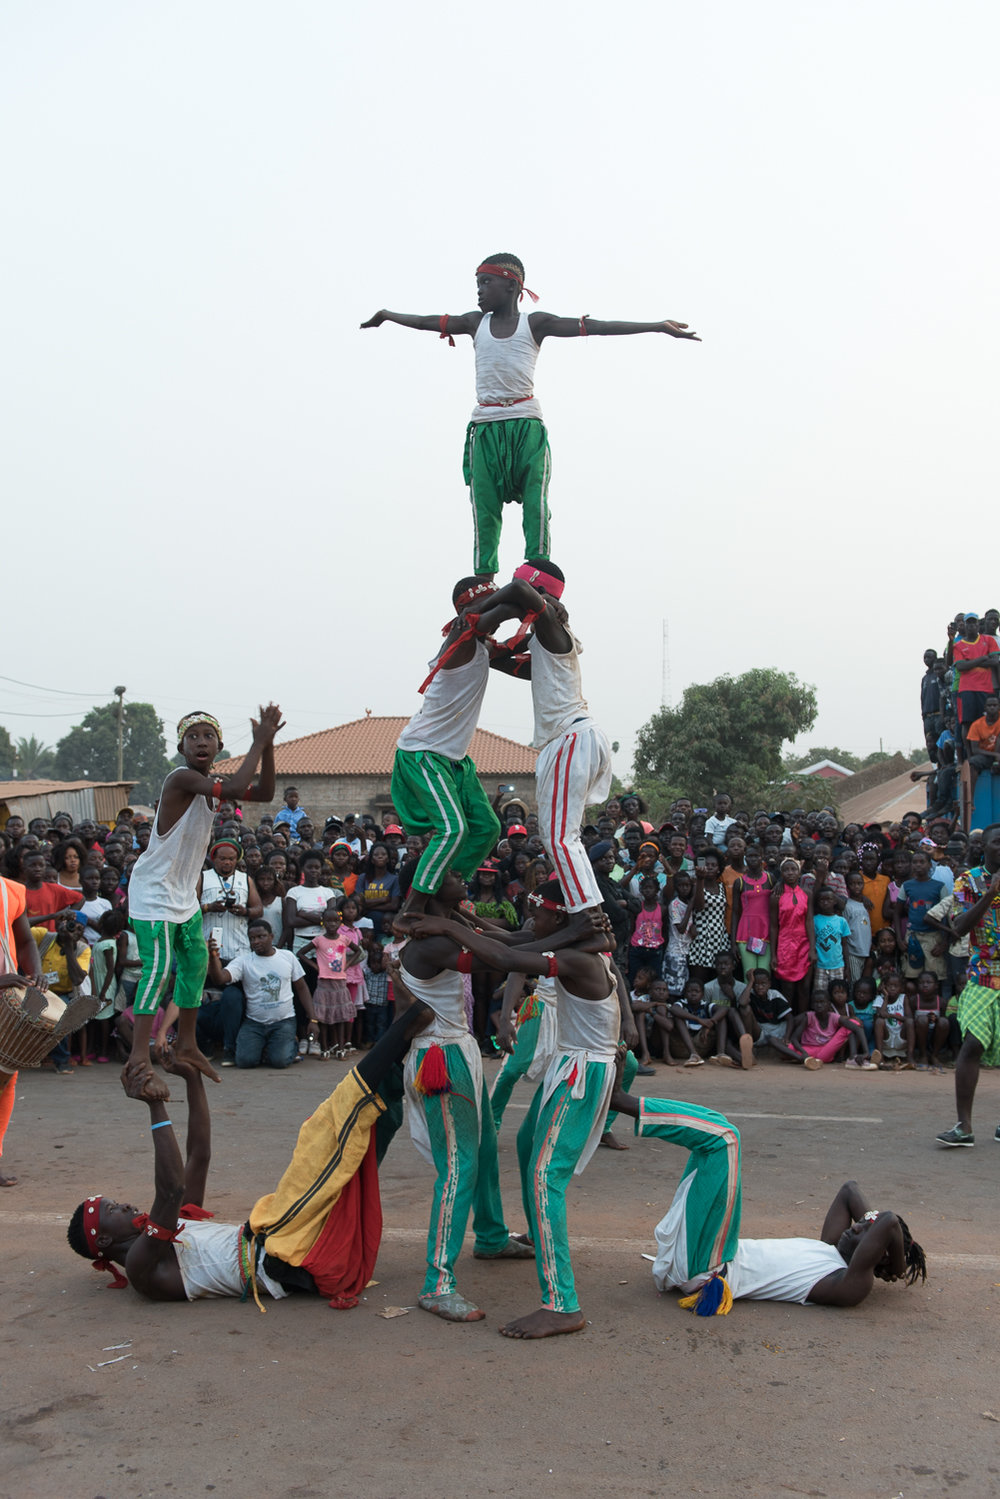 2018_02_Guinea-Bissau_Carnaval_Antula_Brandao_0095.jpg